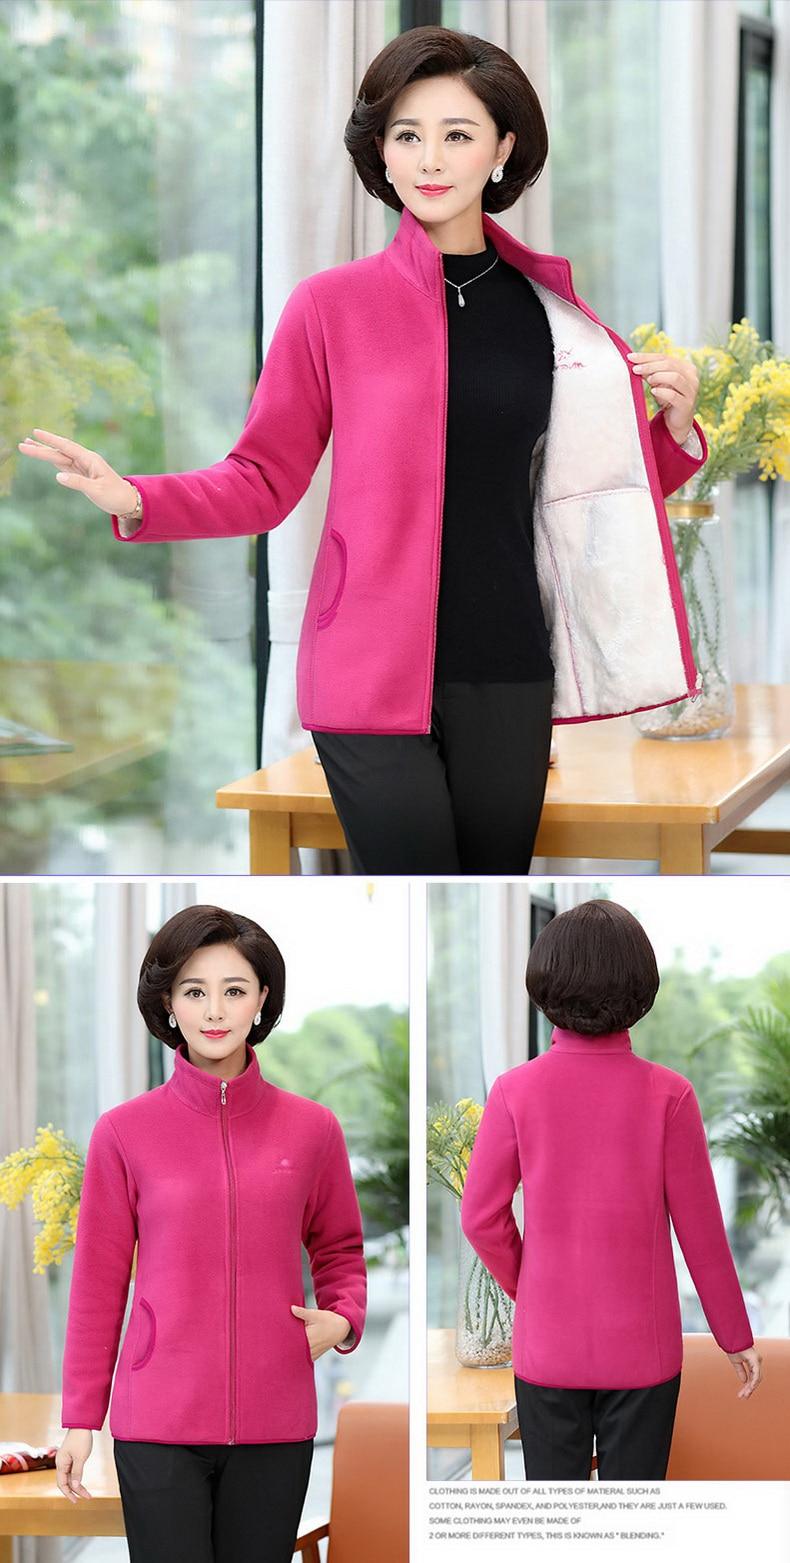 Women Fleece Coat Stand Collar Outerwear Autumn Winter Woman Imitation Lambs Polar Fleece Jacket Warm Lightweight Coat Woman (8)